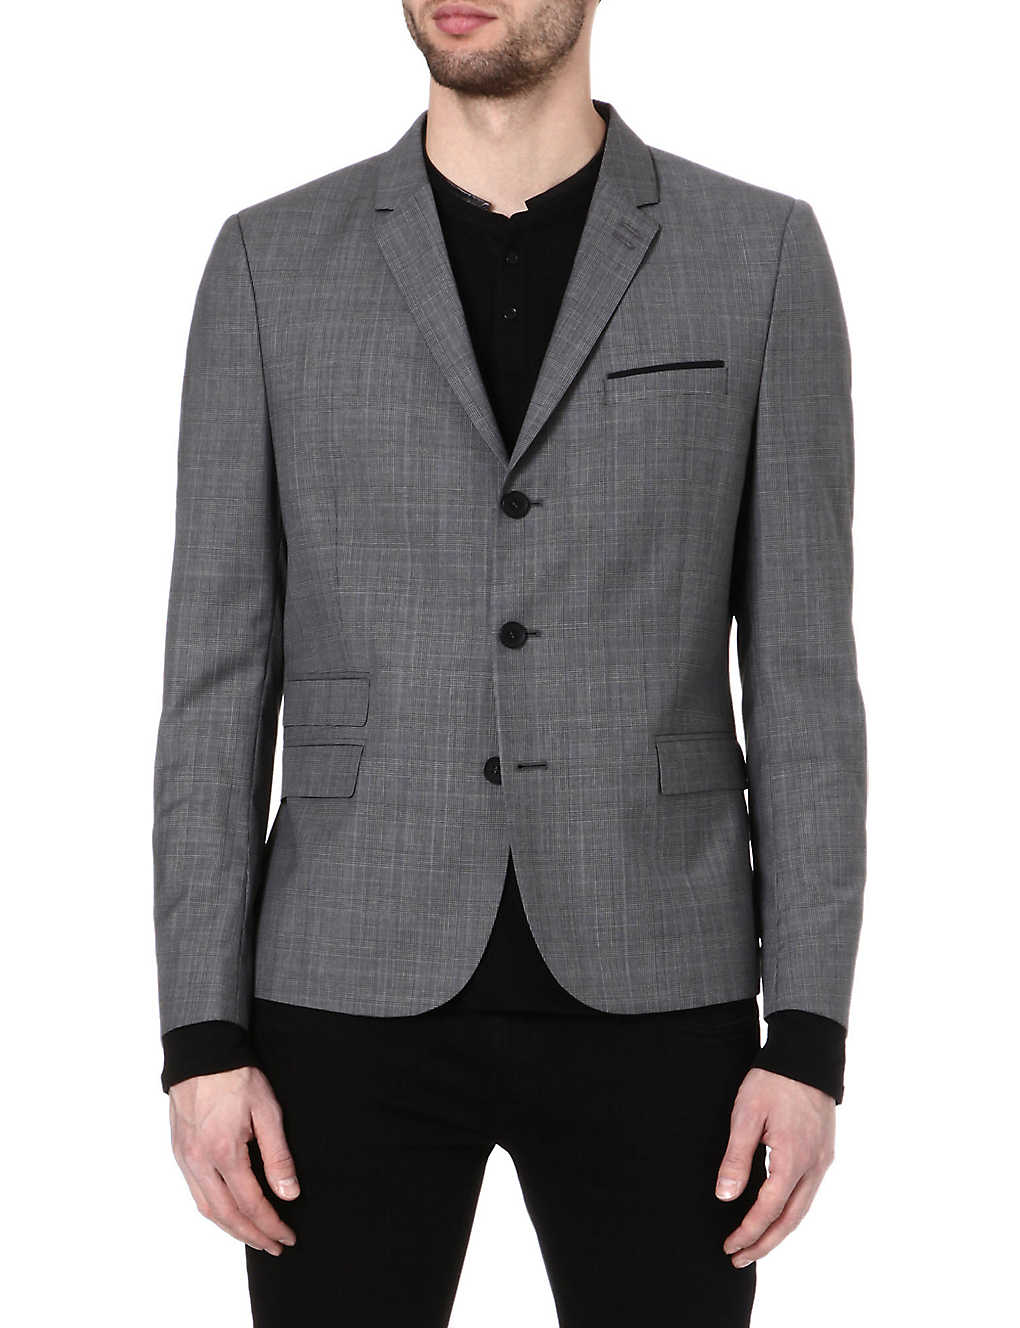 32cd72c1db2 THE KOOPLES - Prince of Wales suit jacket | Selfridges.com